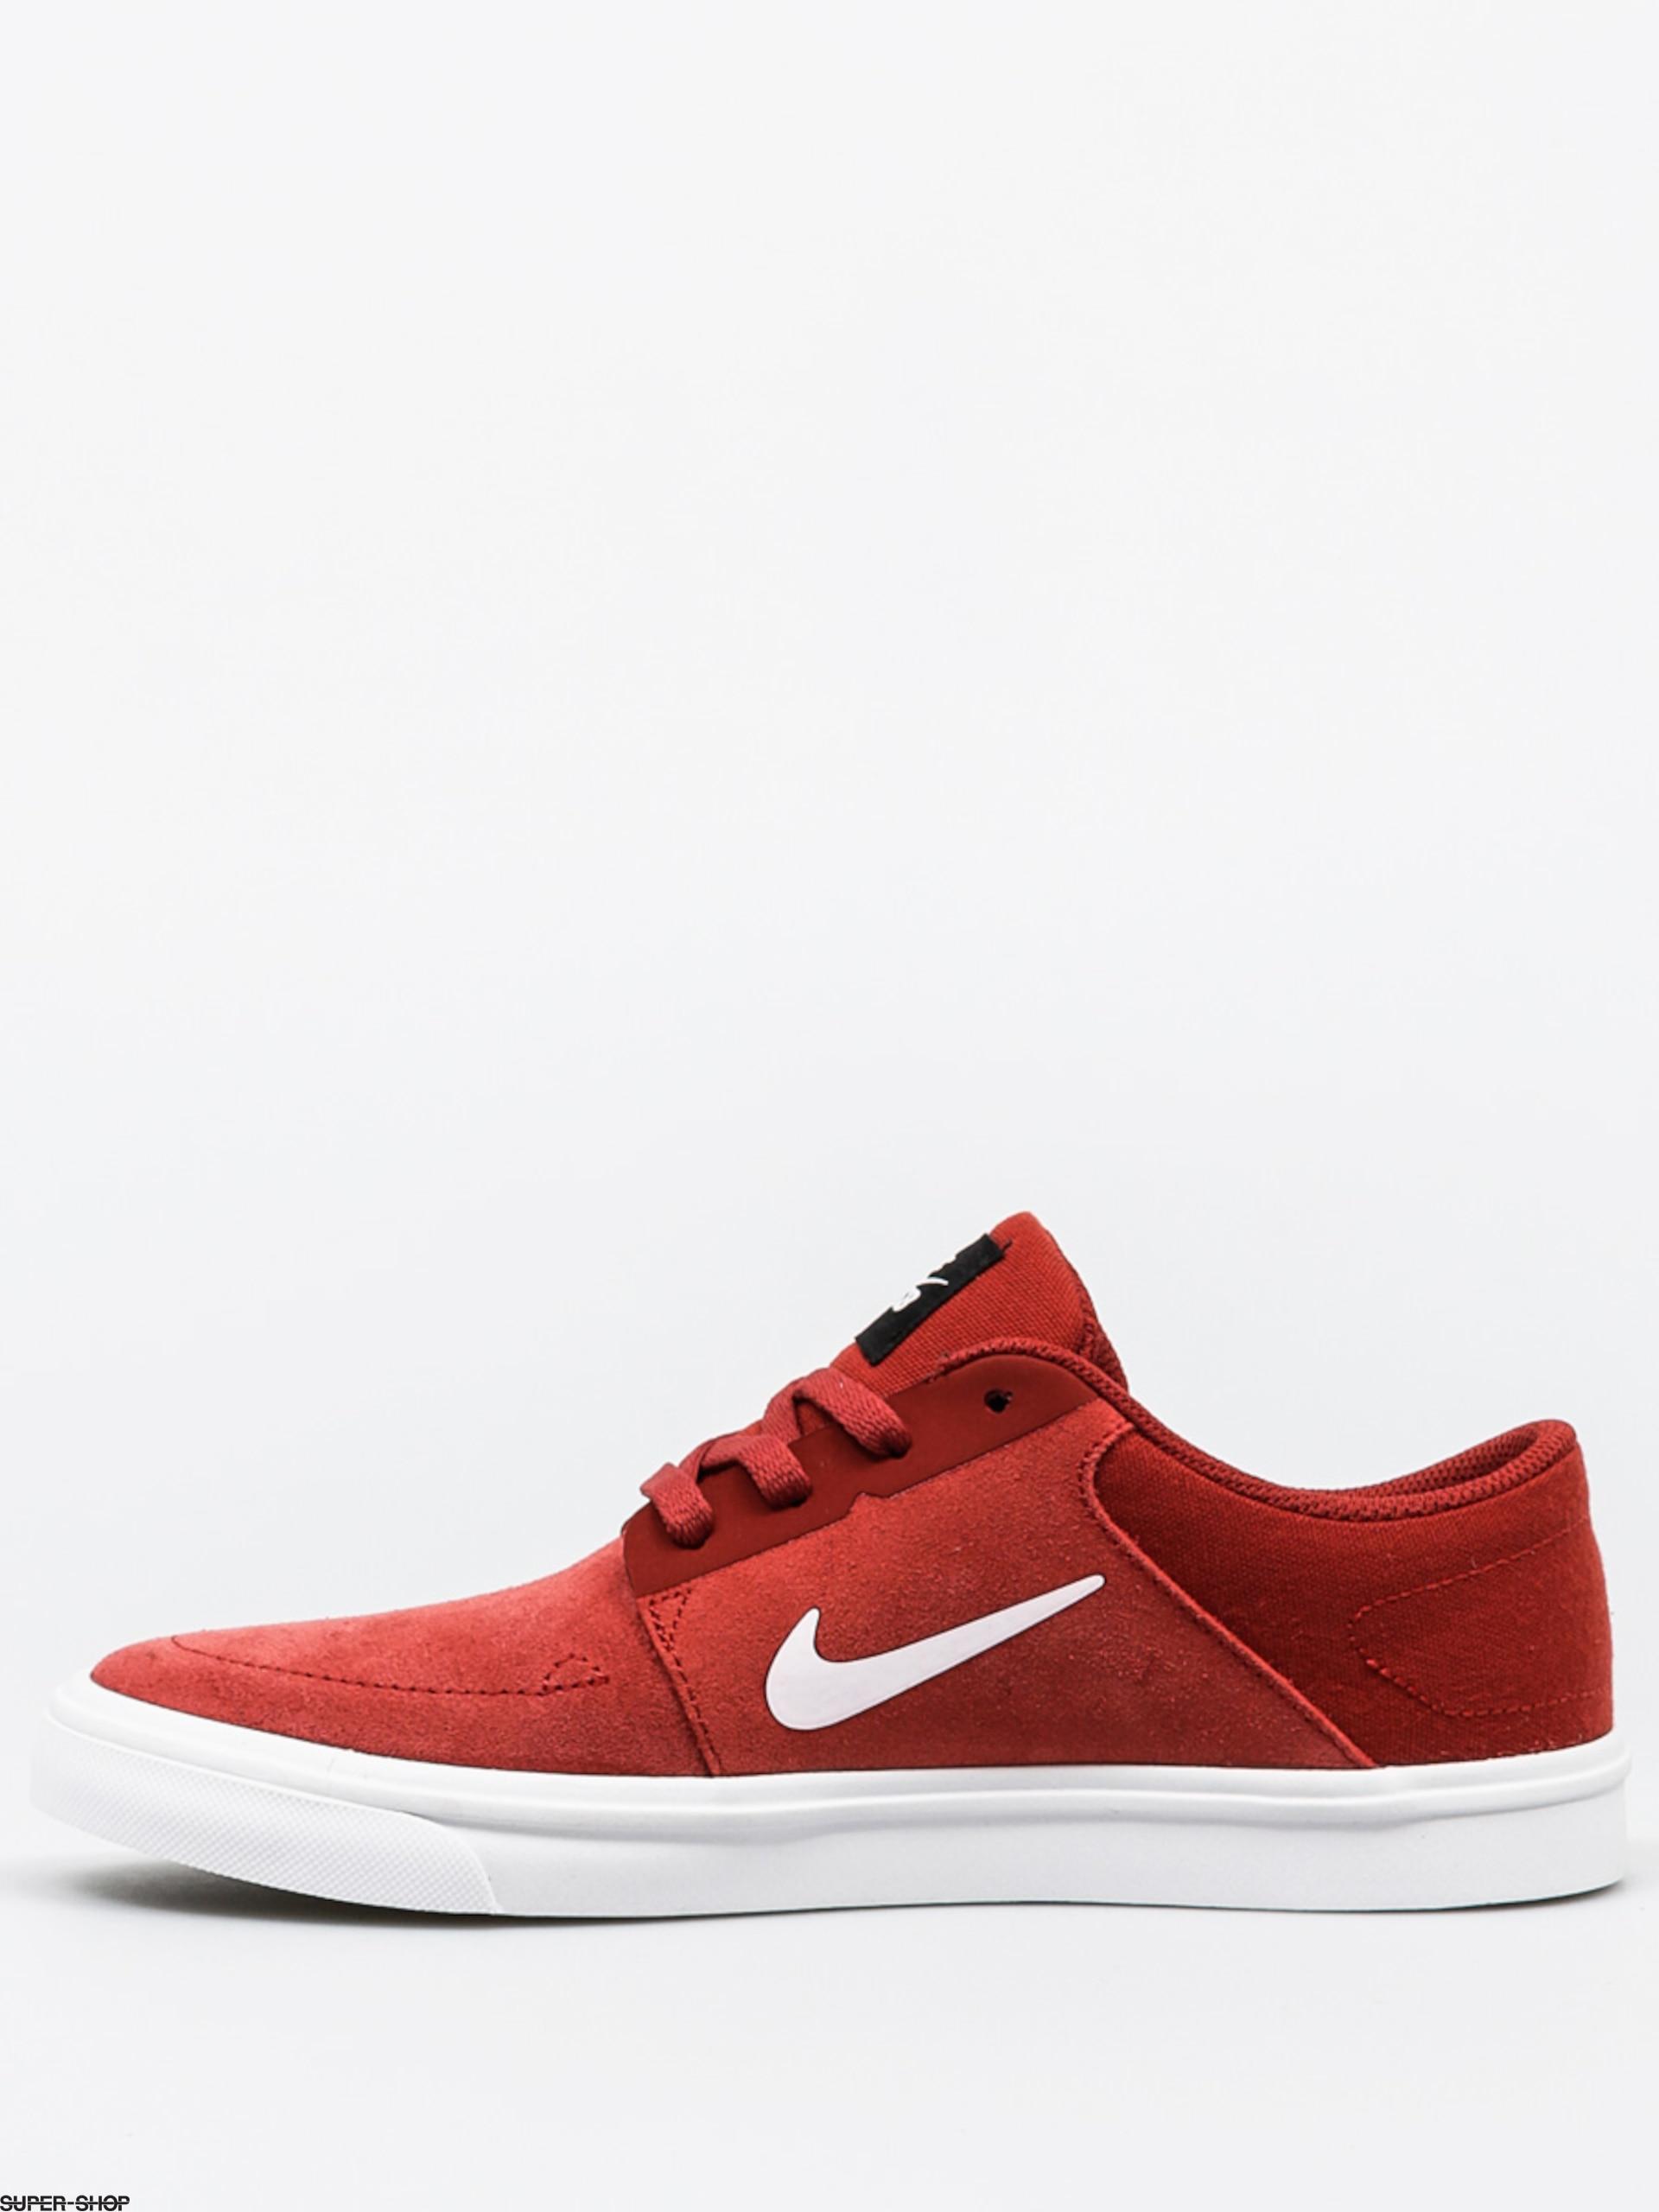 5b45ab109d92 Nike SB Kids shoes Portmore (dark cayenne white black)